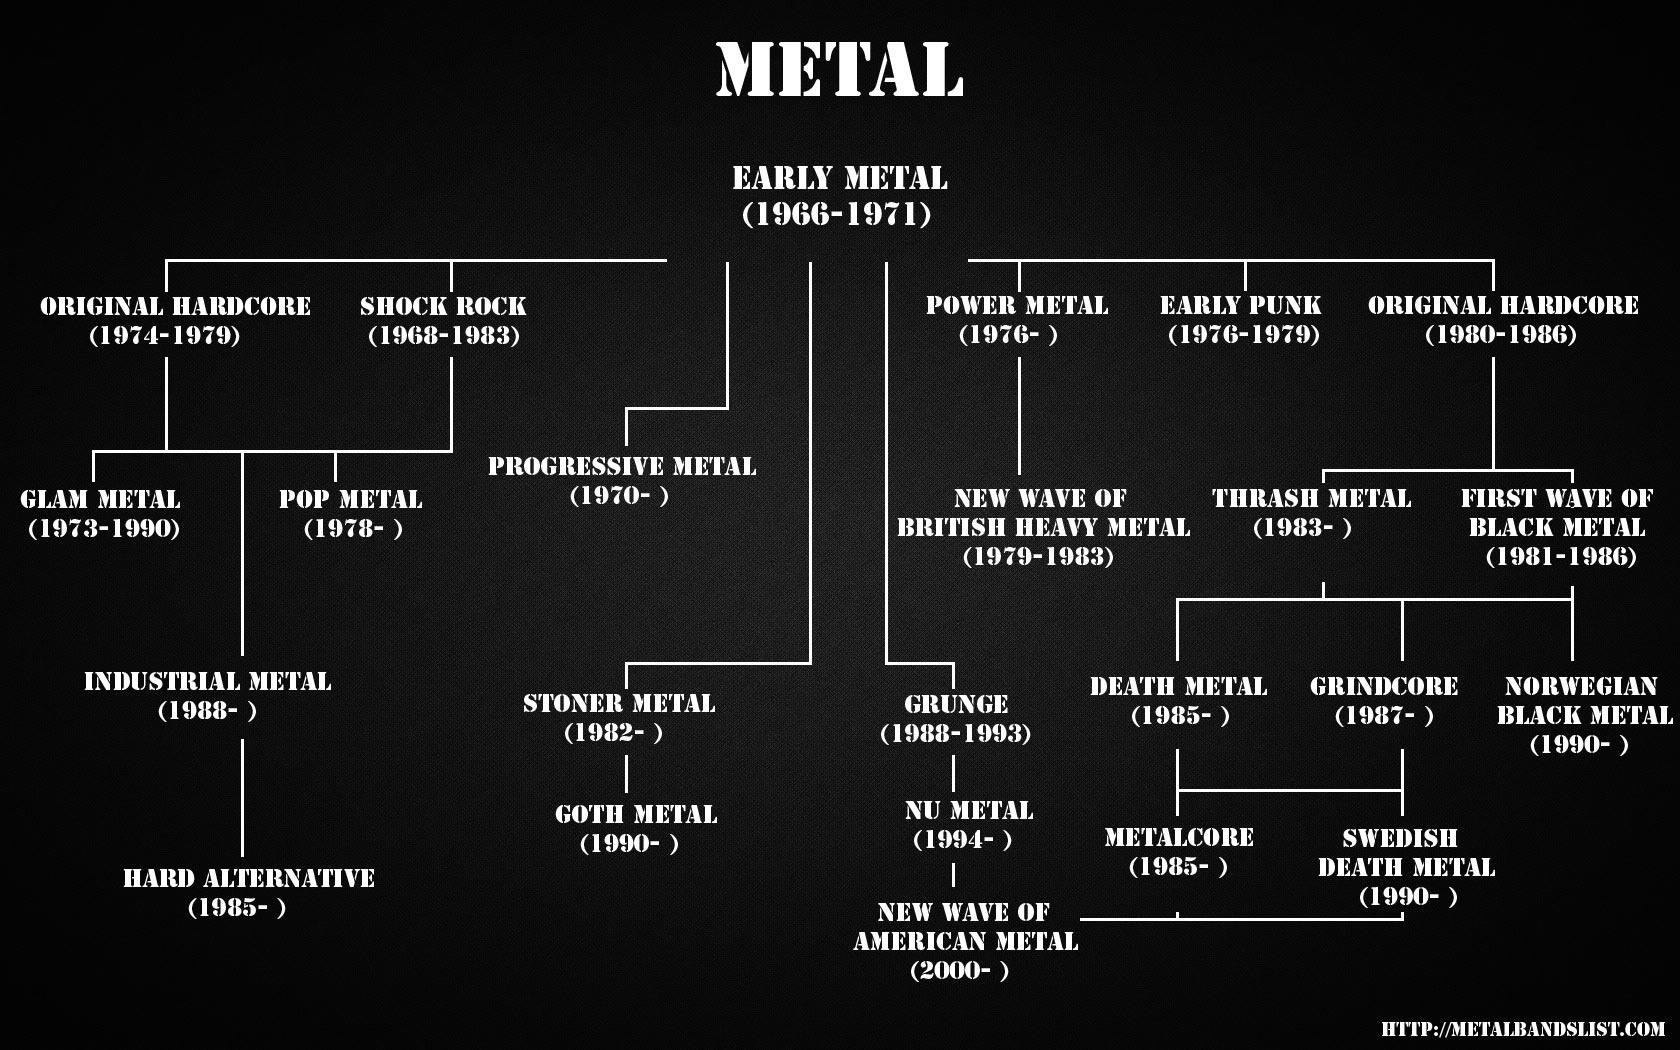 Dating reddit metalhead Urban Dictionary: